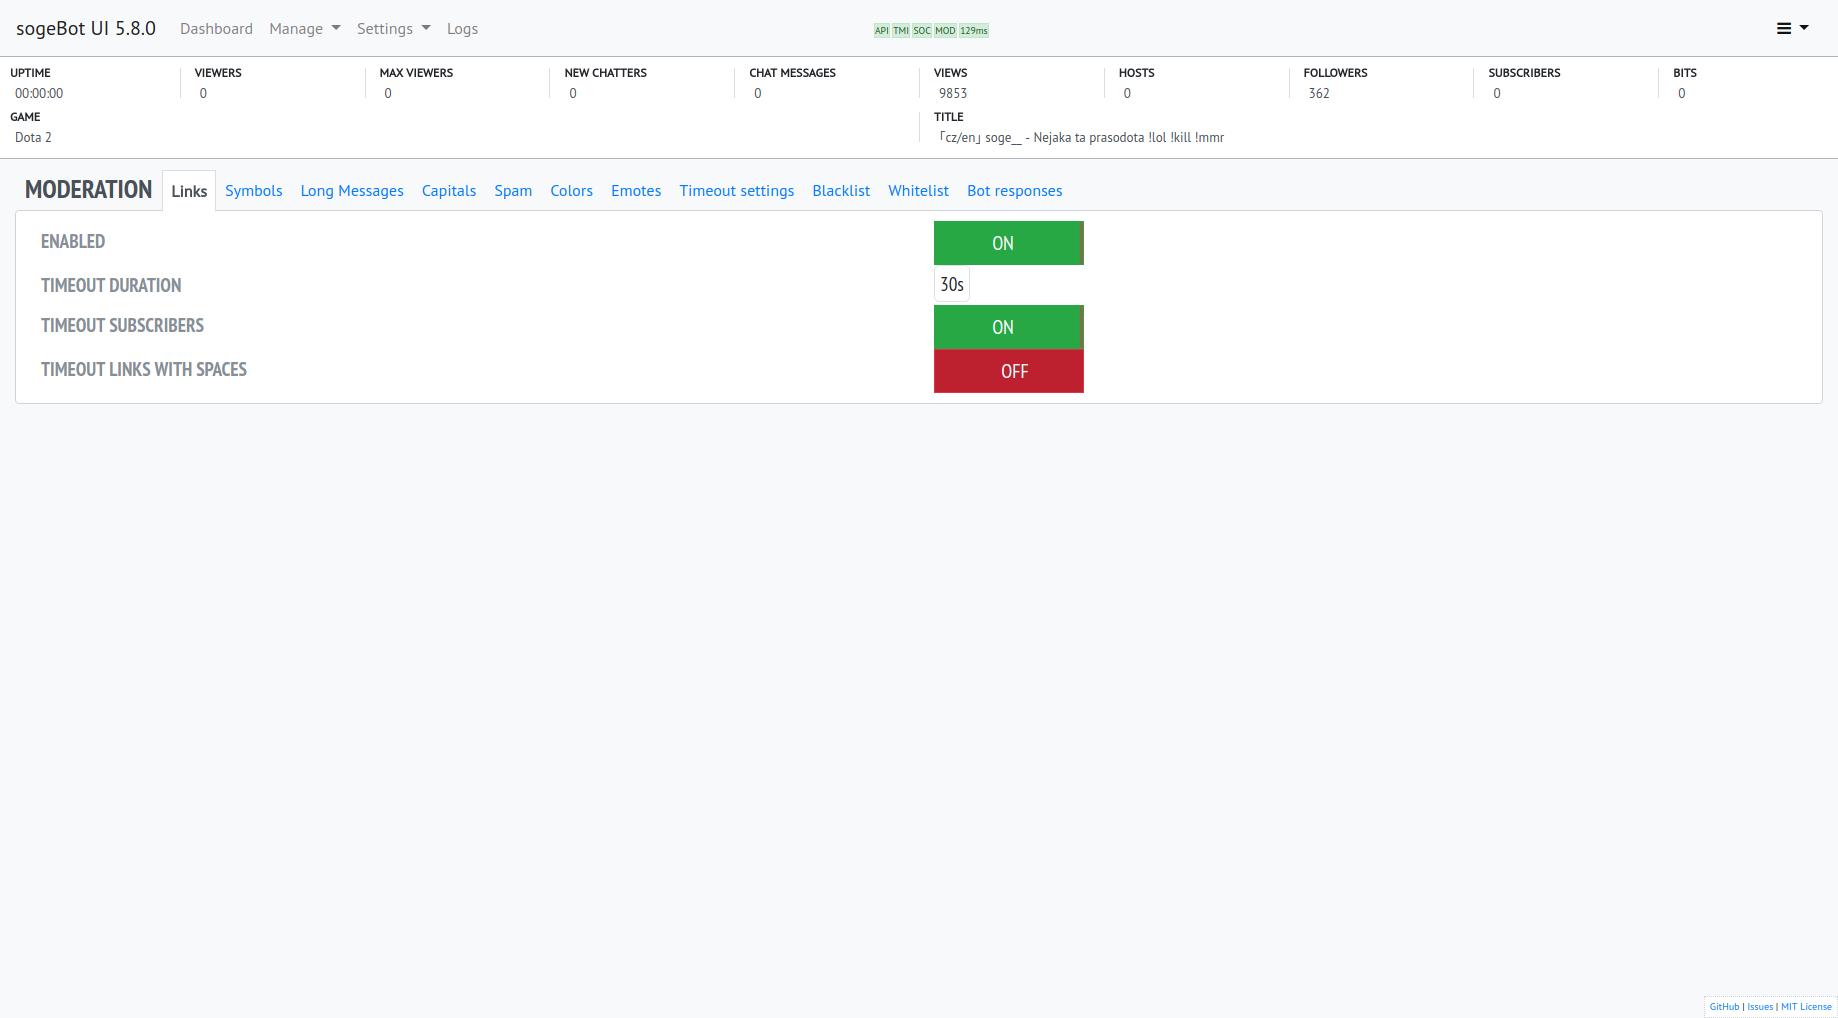 GitHub - sogehige/sogeBot: sogeBot - Free Twitch Bot built on Node js